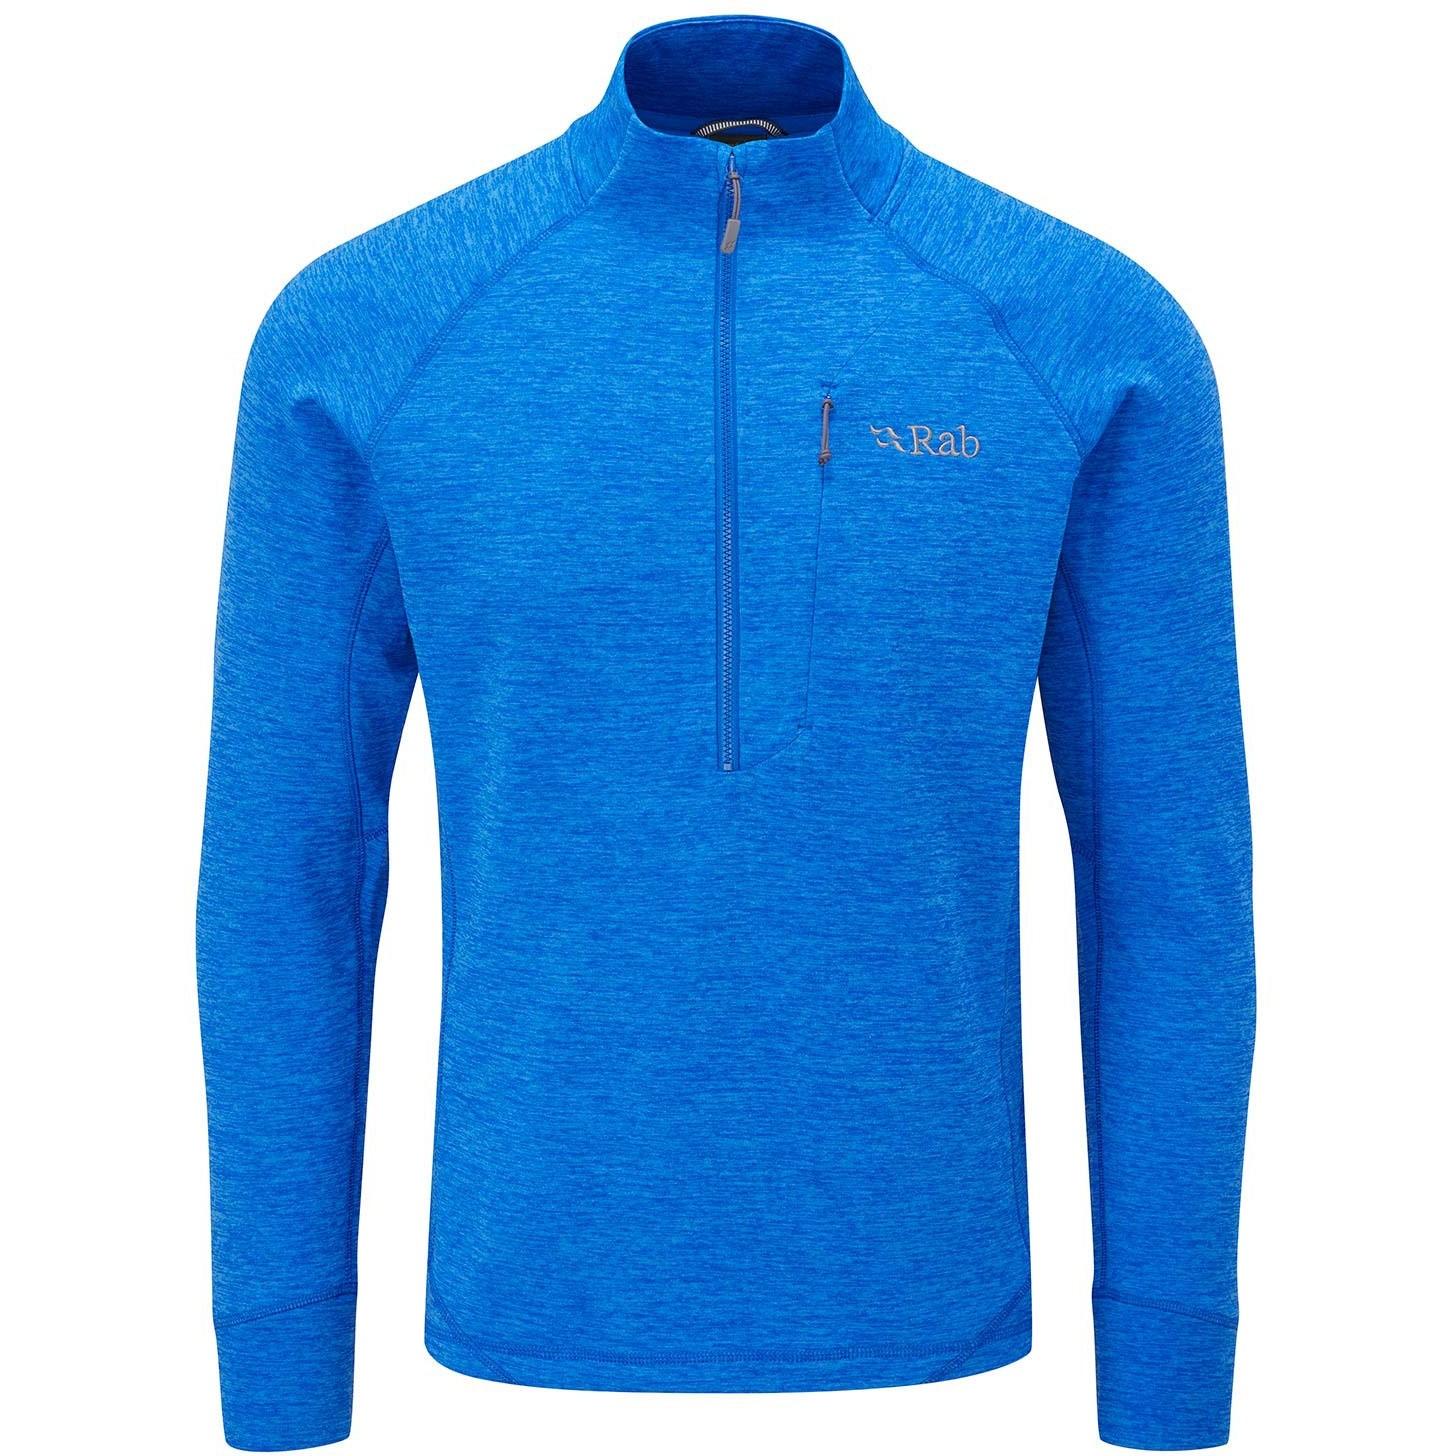 Rab Nexus Pull-On Fleece - Men's - Polar Blue